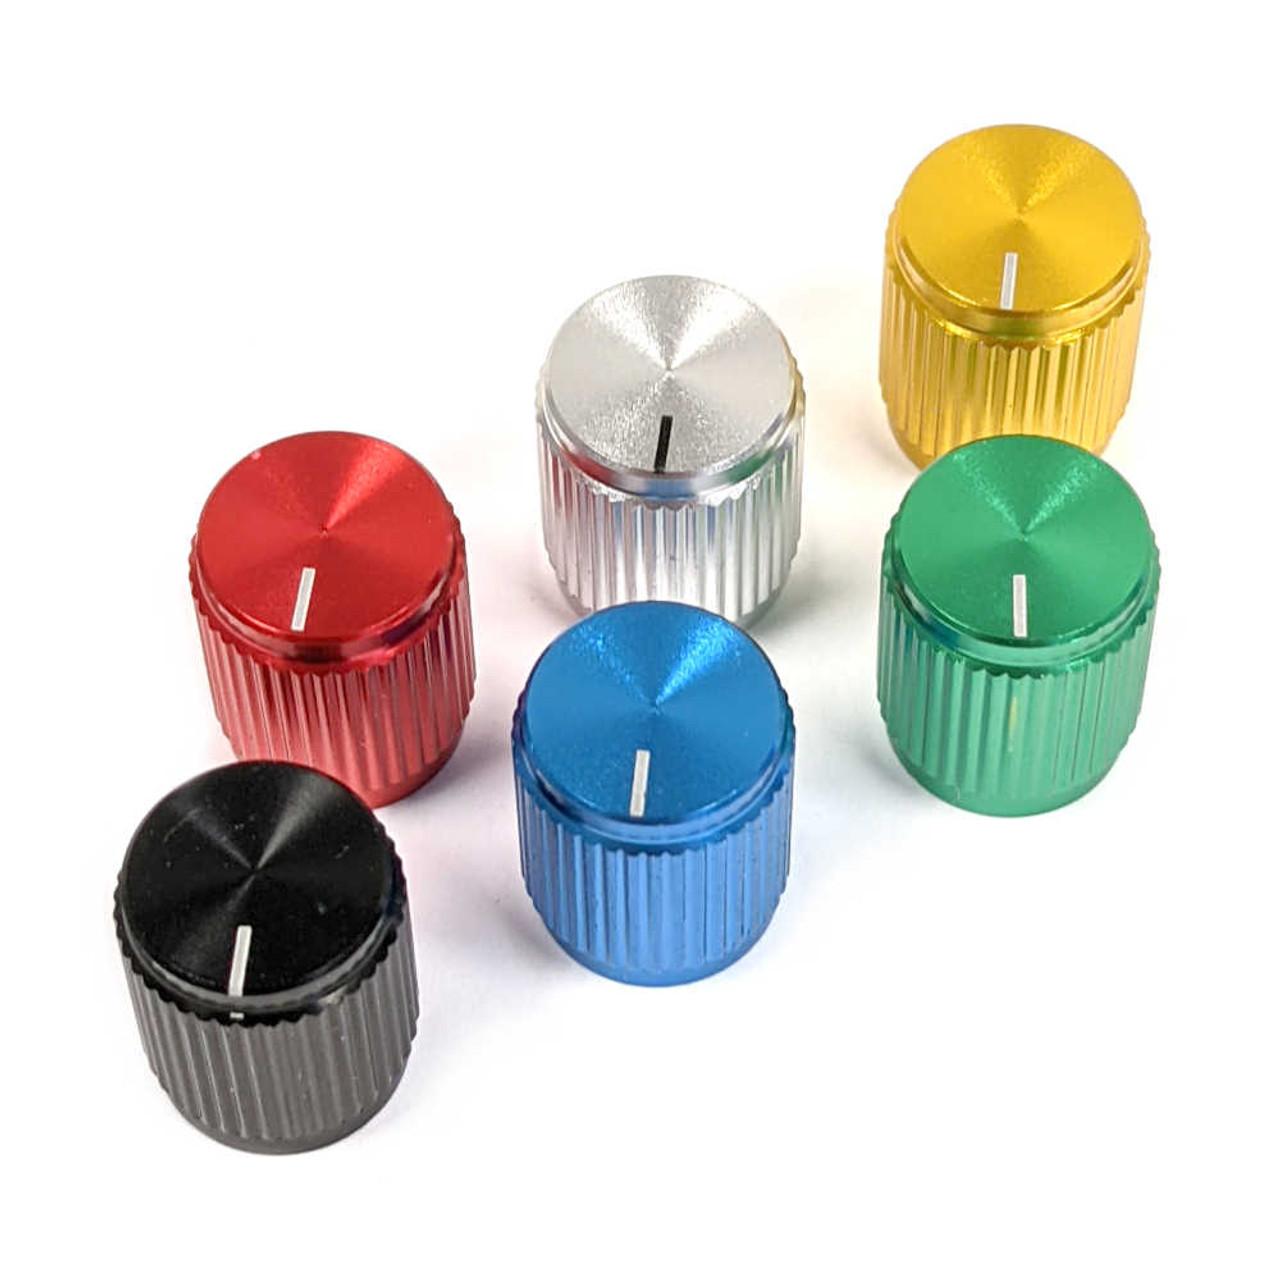 Anodized Aluminum Knob - Small (Choose Colour)